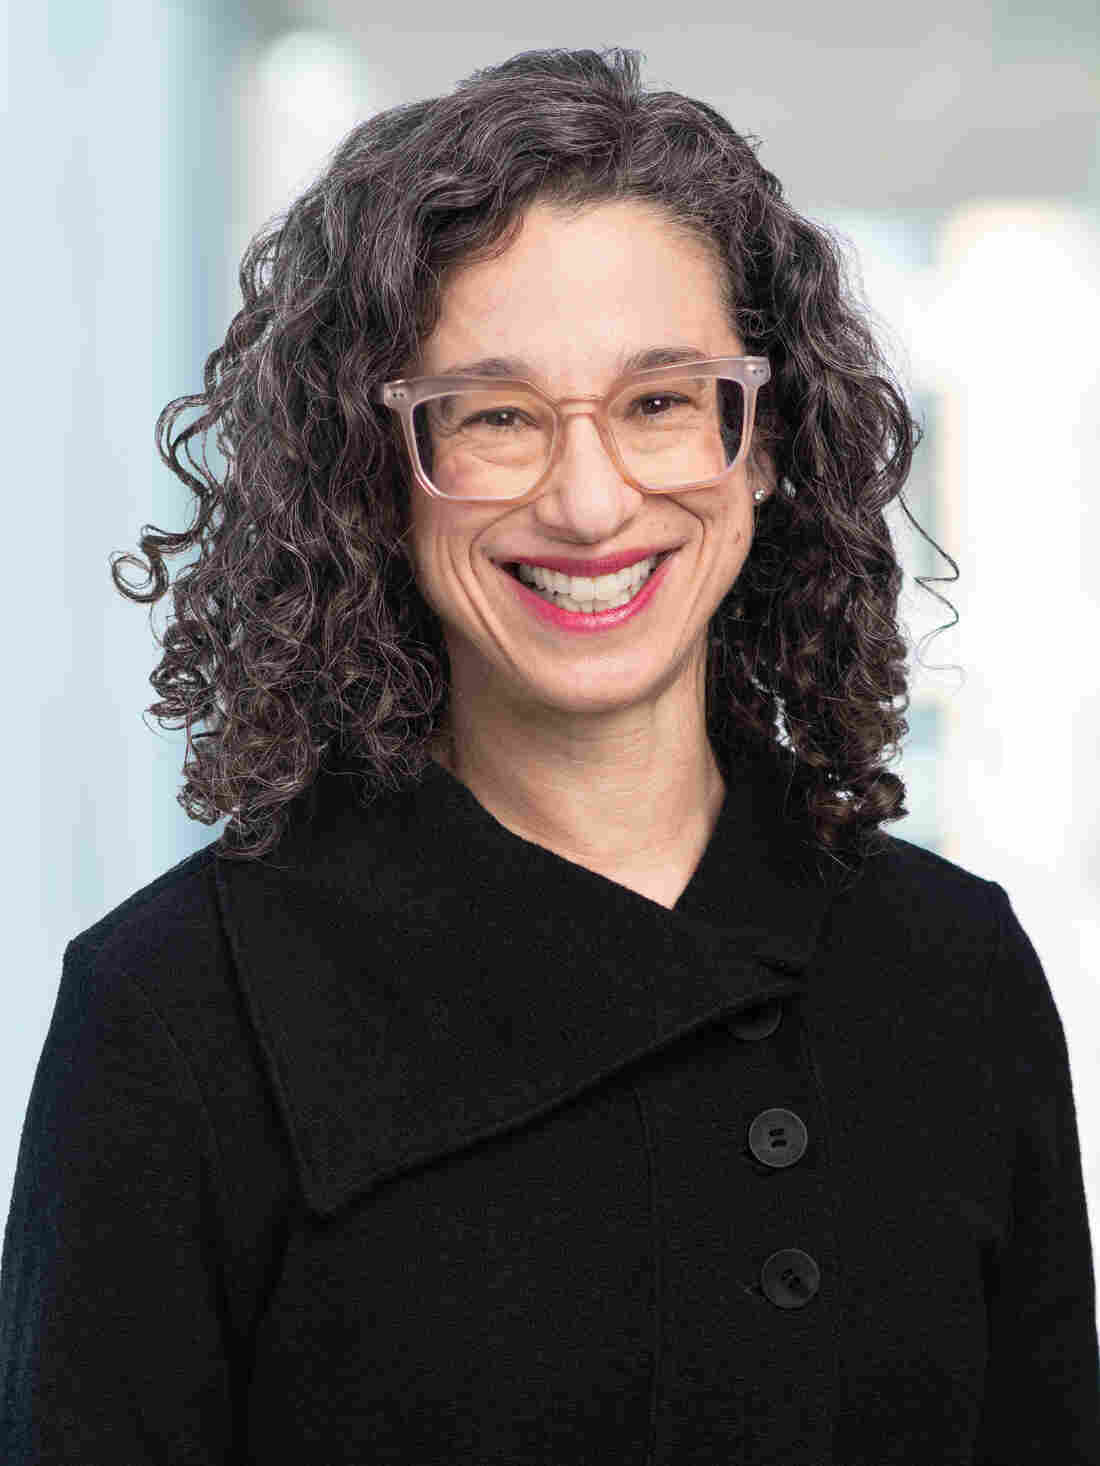 Tamar Charney, photographed for NPR, 13 November 2019, in Washington DC.